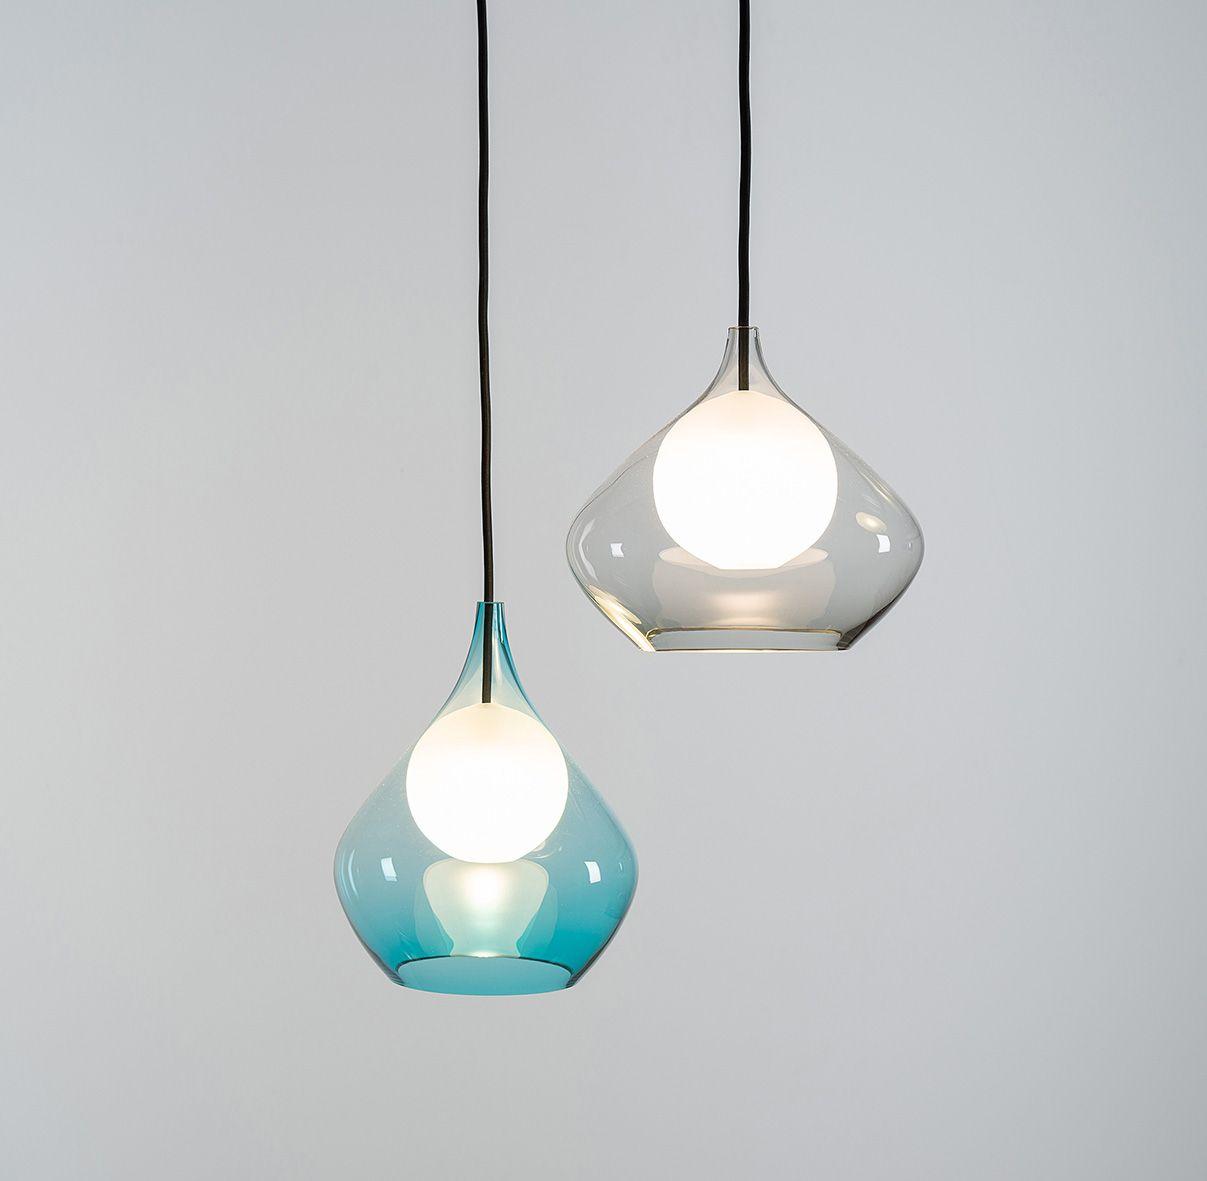 "Ceiling Lamp Shades At Next: ""Next Shade"" Pendant /isabel Hamm Licht"